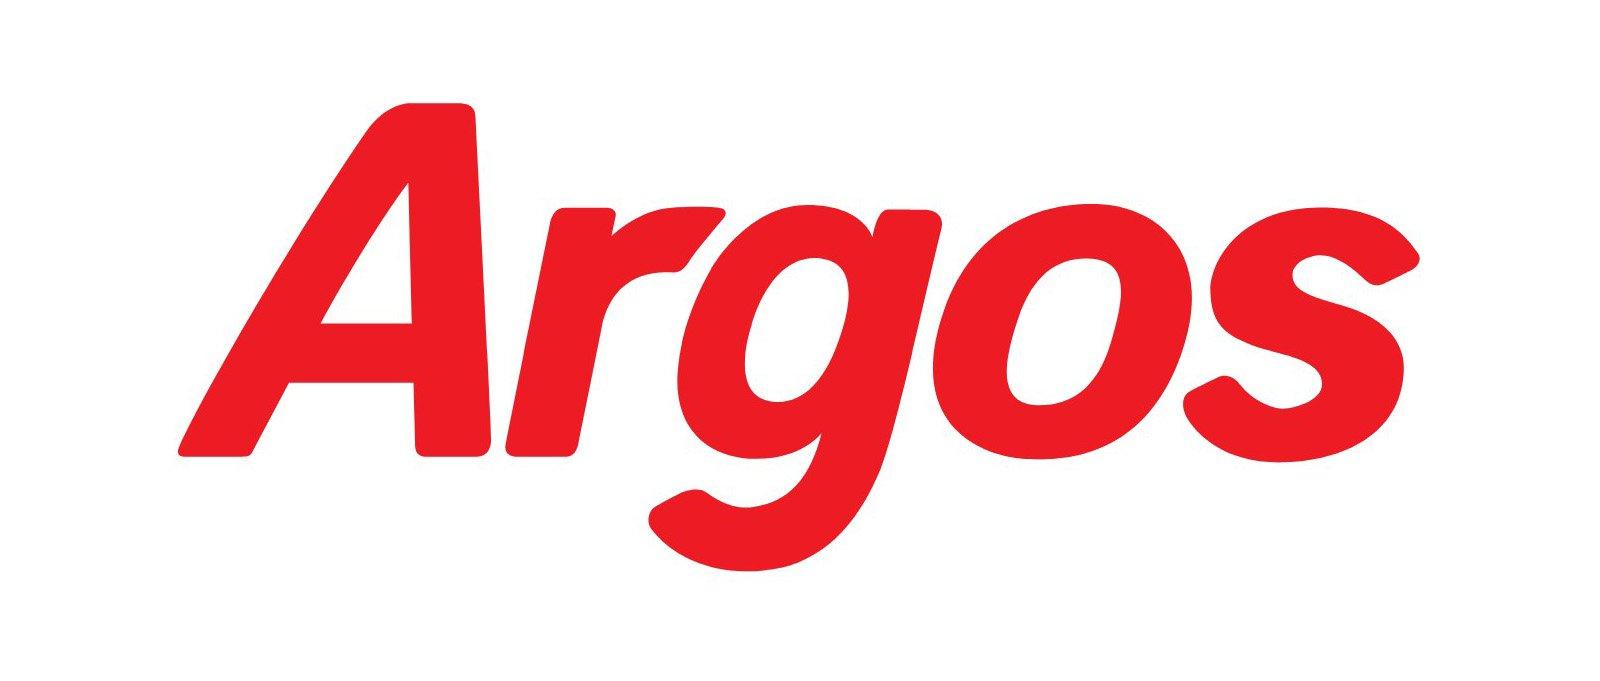 Argos Logo Argos Symbol Meaning History And Evolution